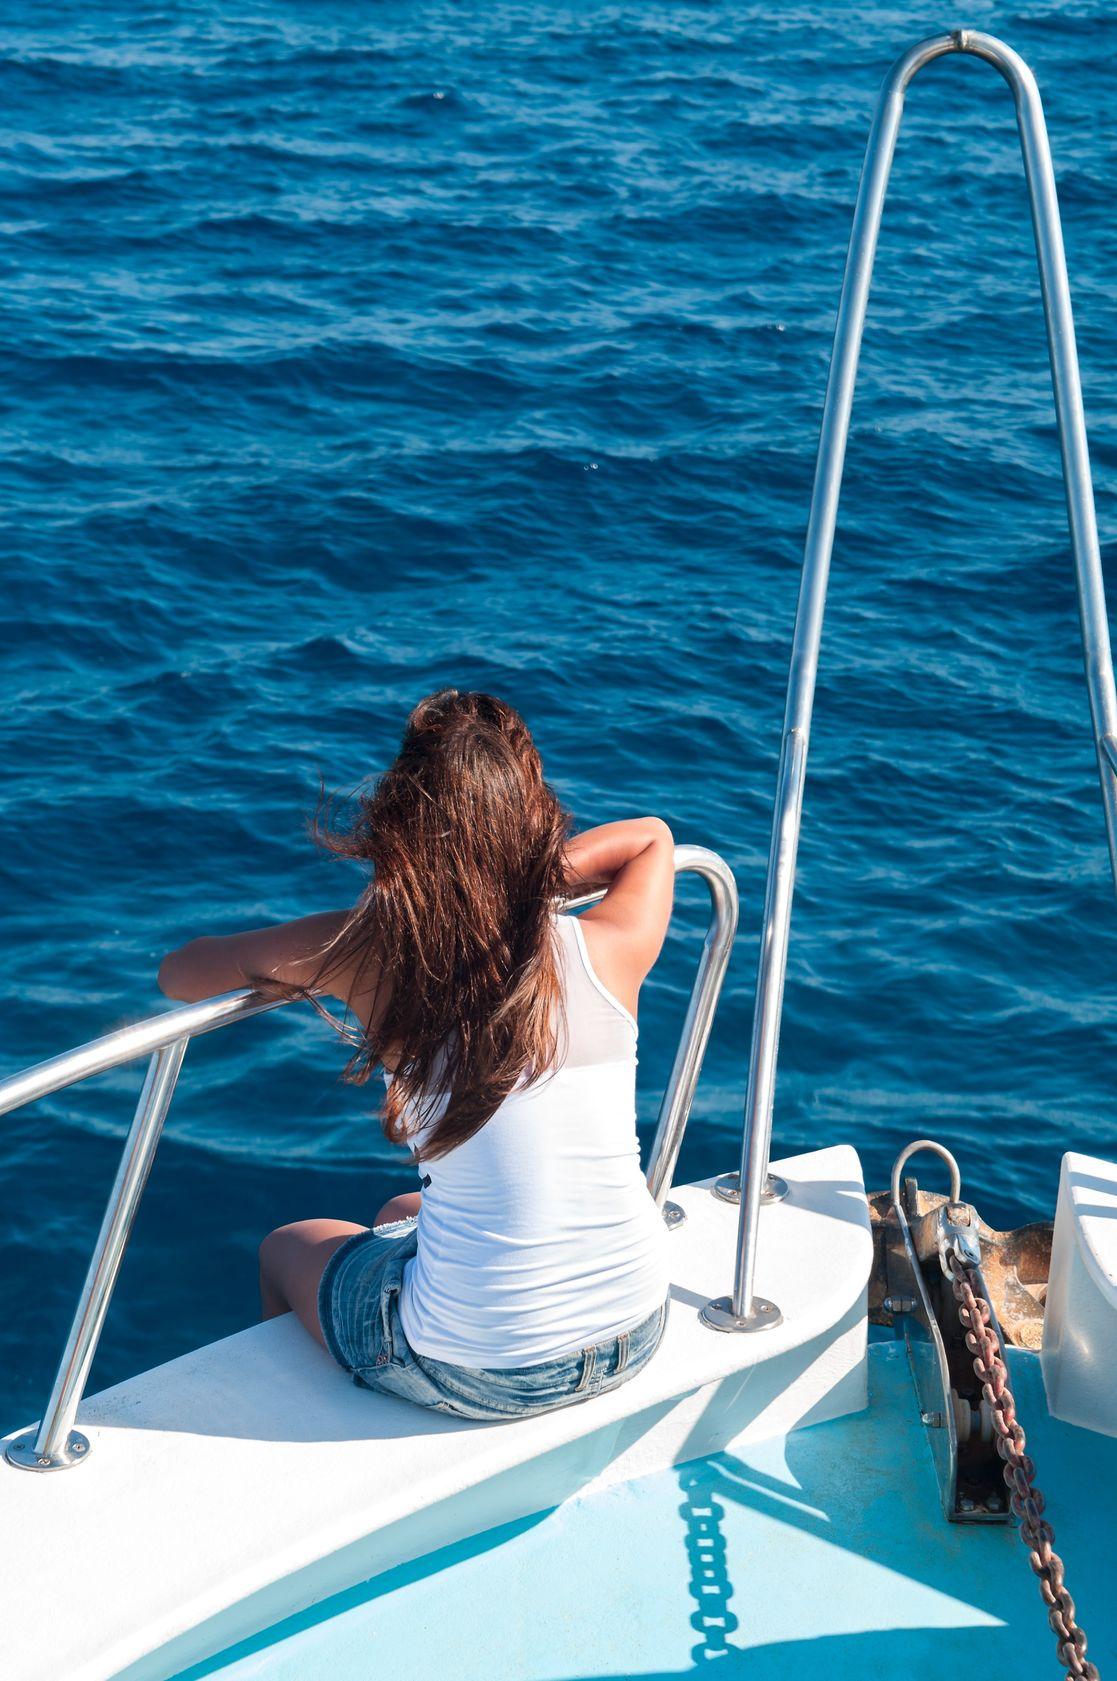 Managing a boat sharing partnership in the off season